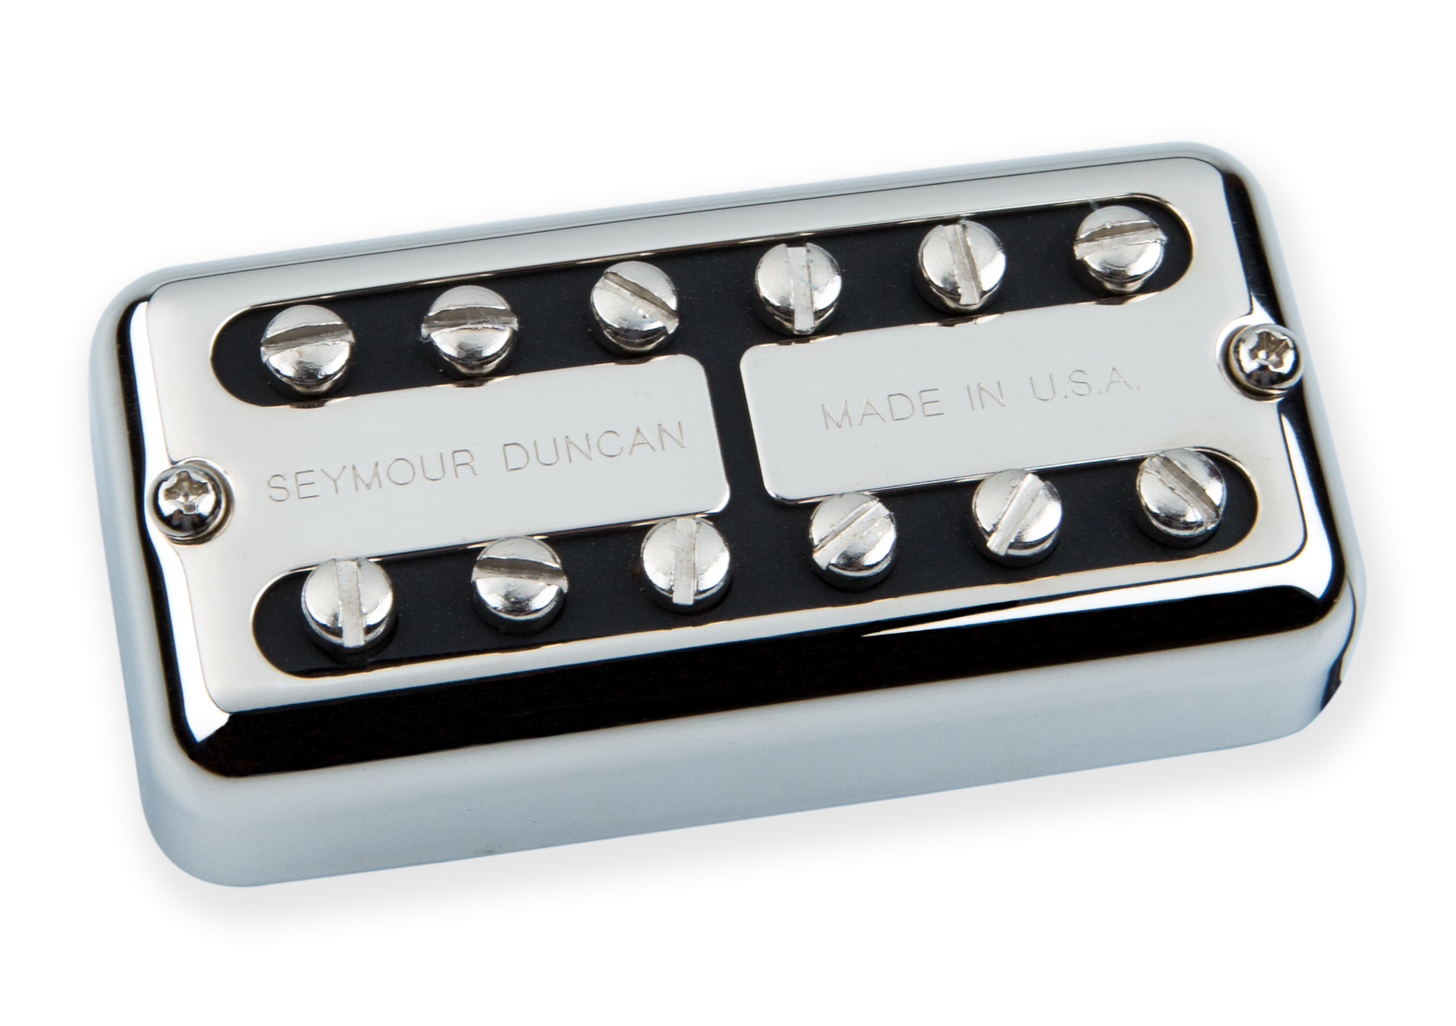 Seymour Duncan Psyclone Hot - Bridge Nickel